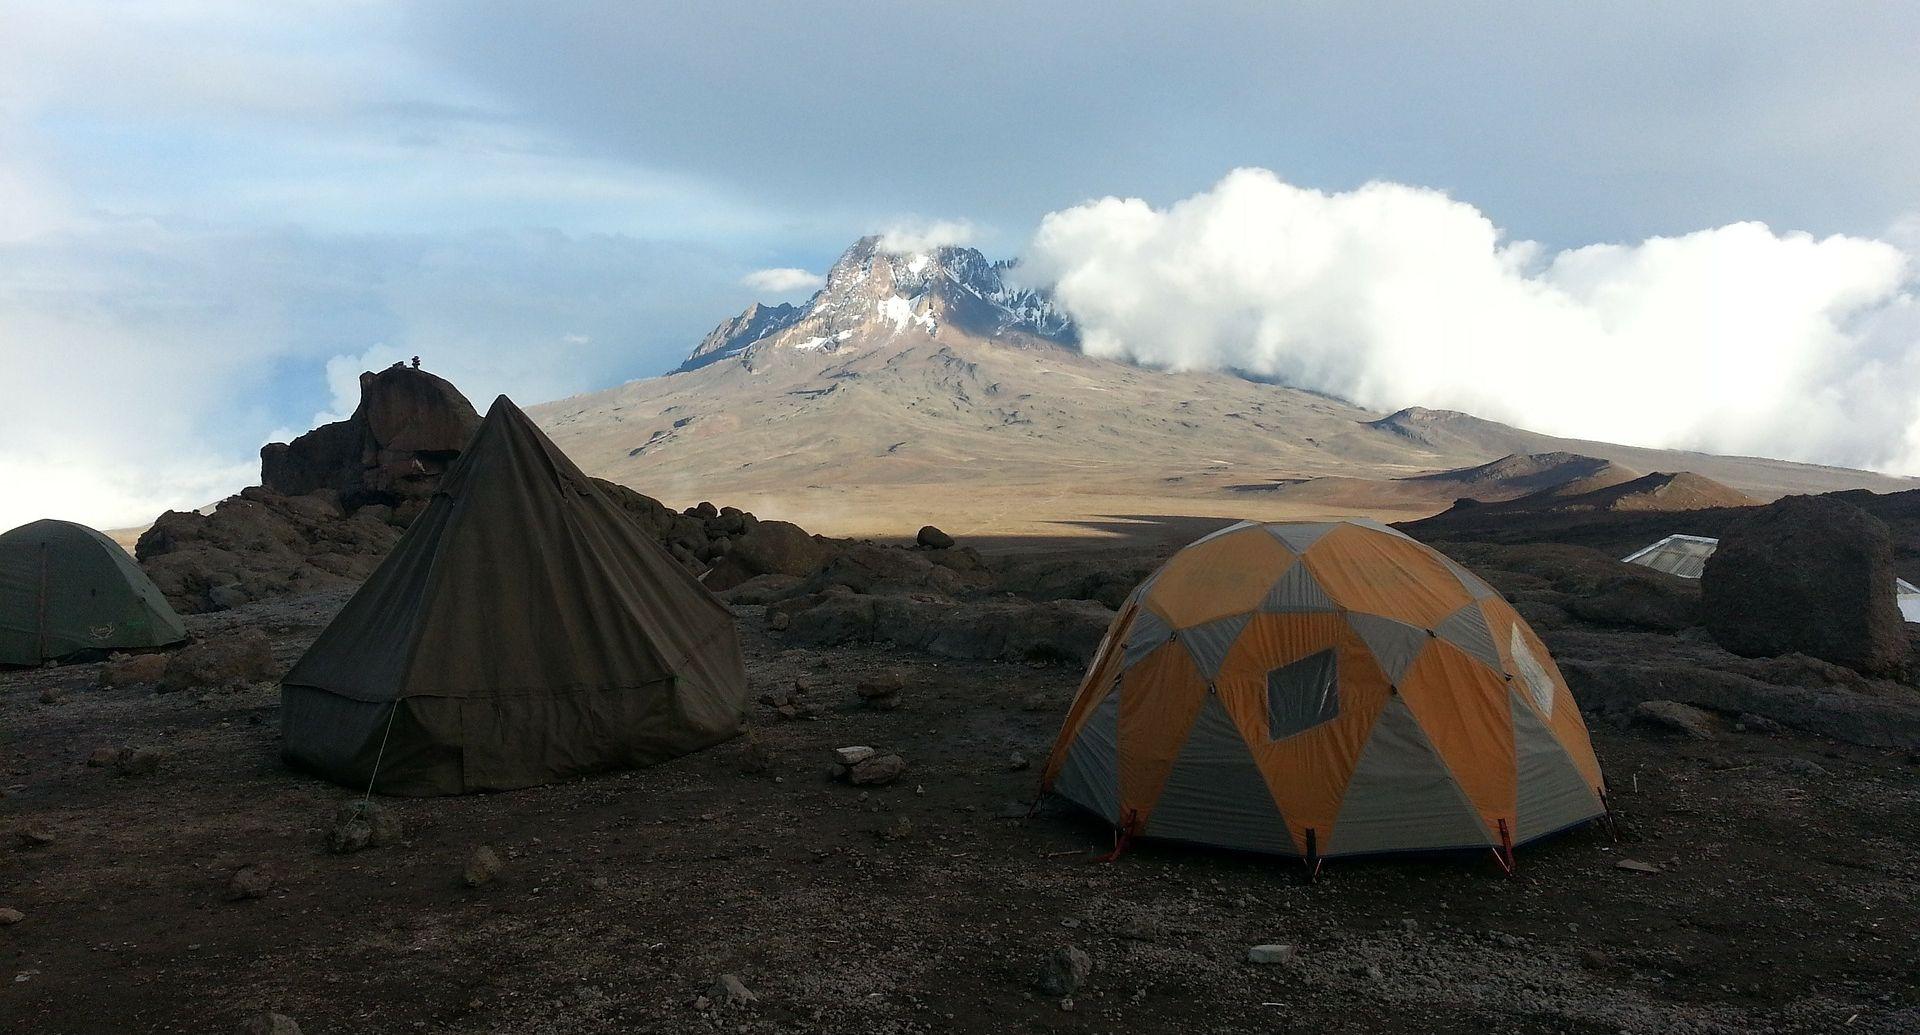 HRABRA ROXY Osmogodišnja Amerikanka osvojila Kilimanjaro